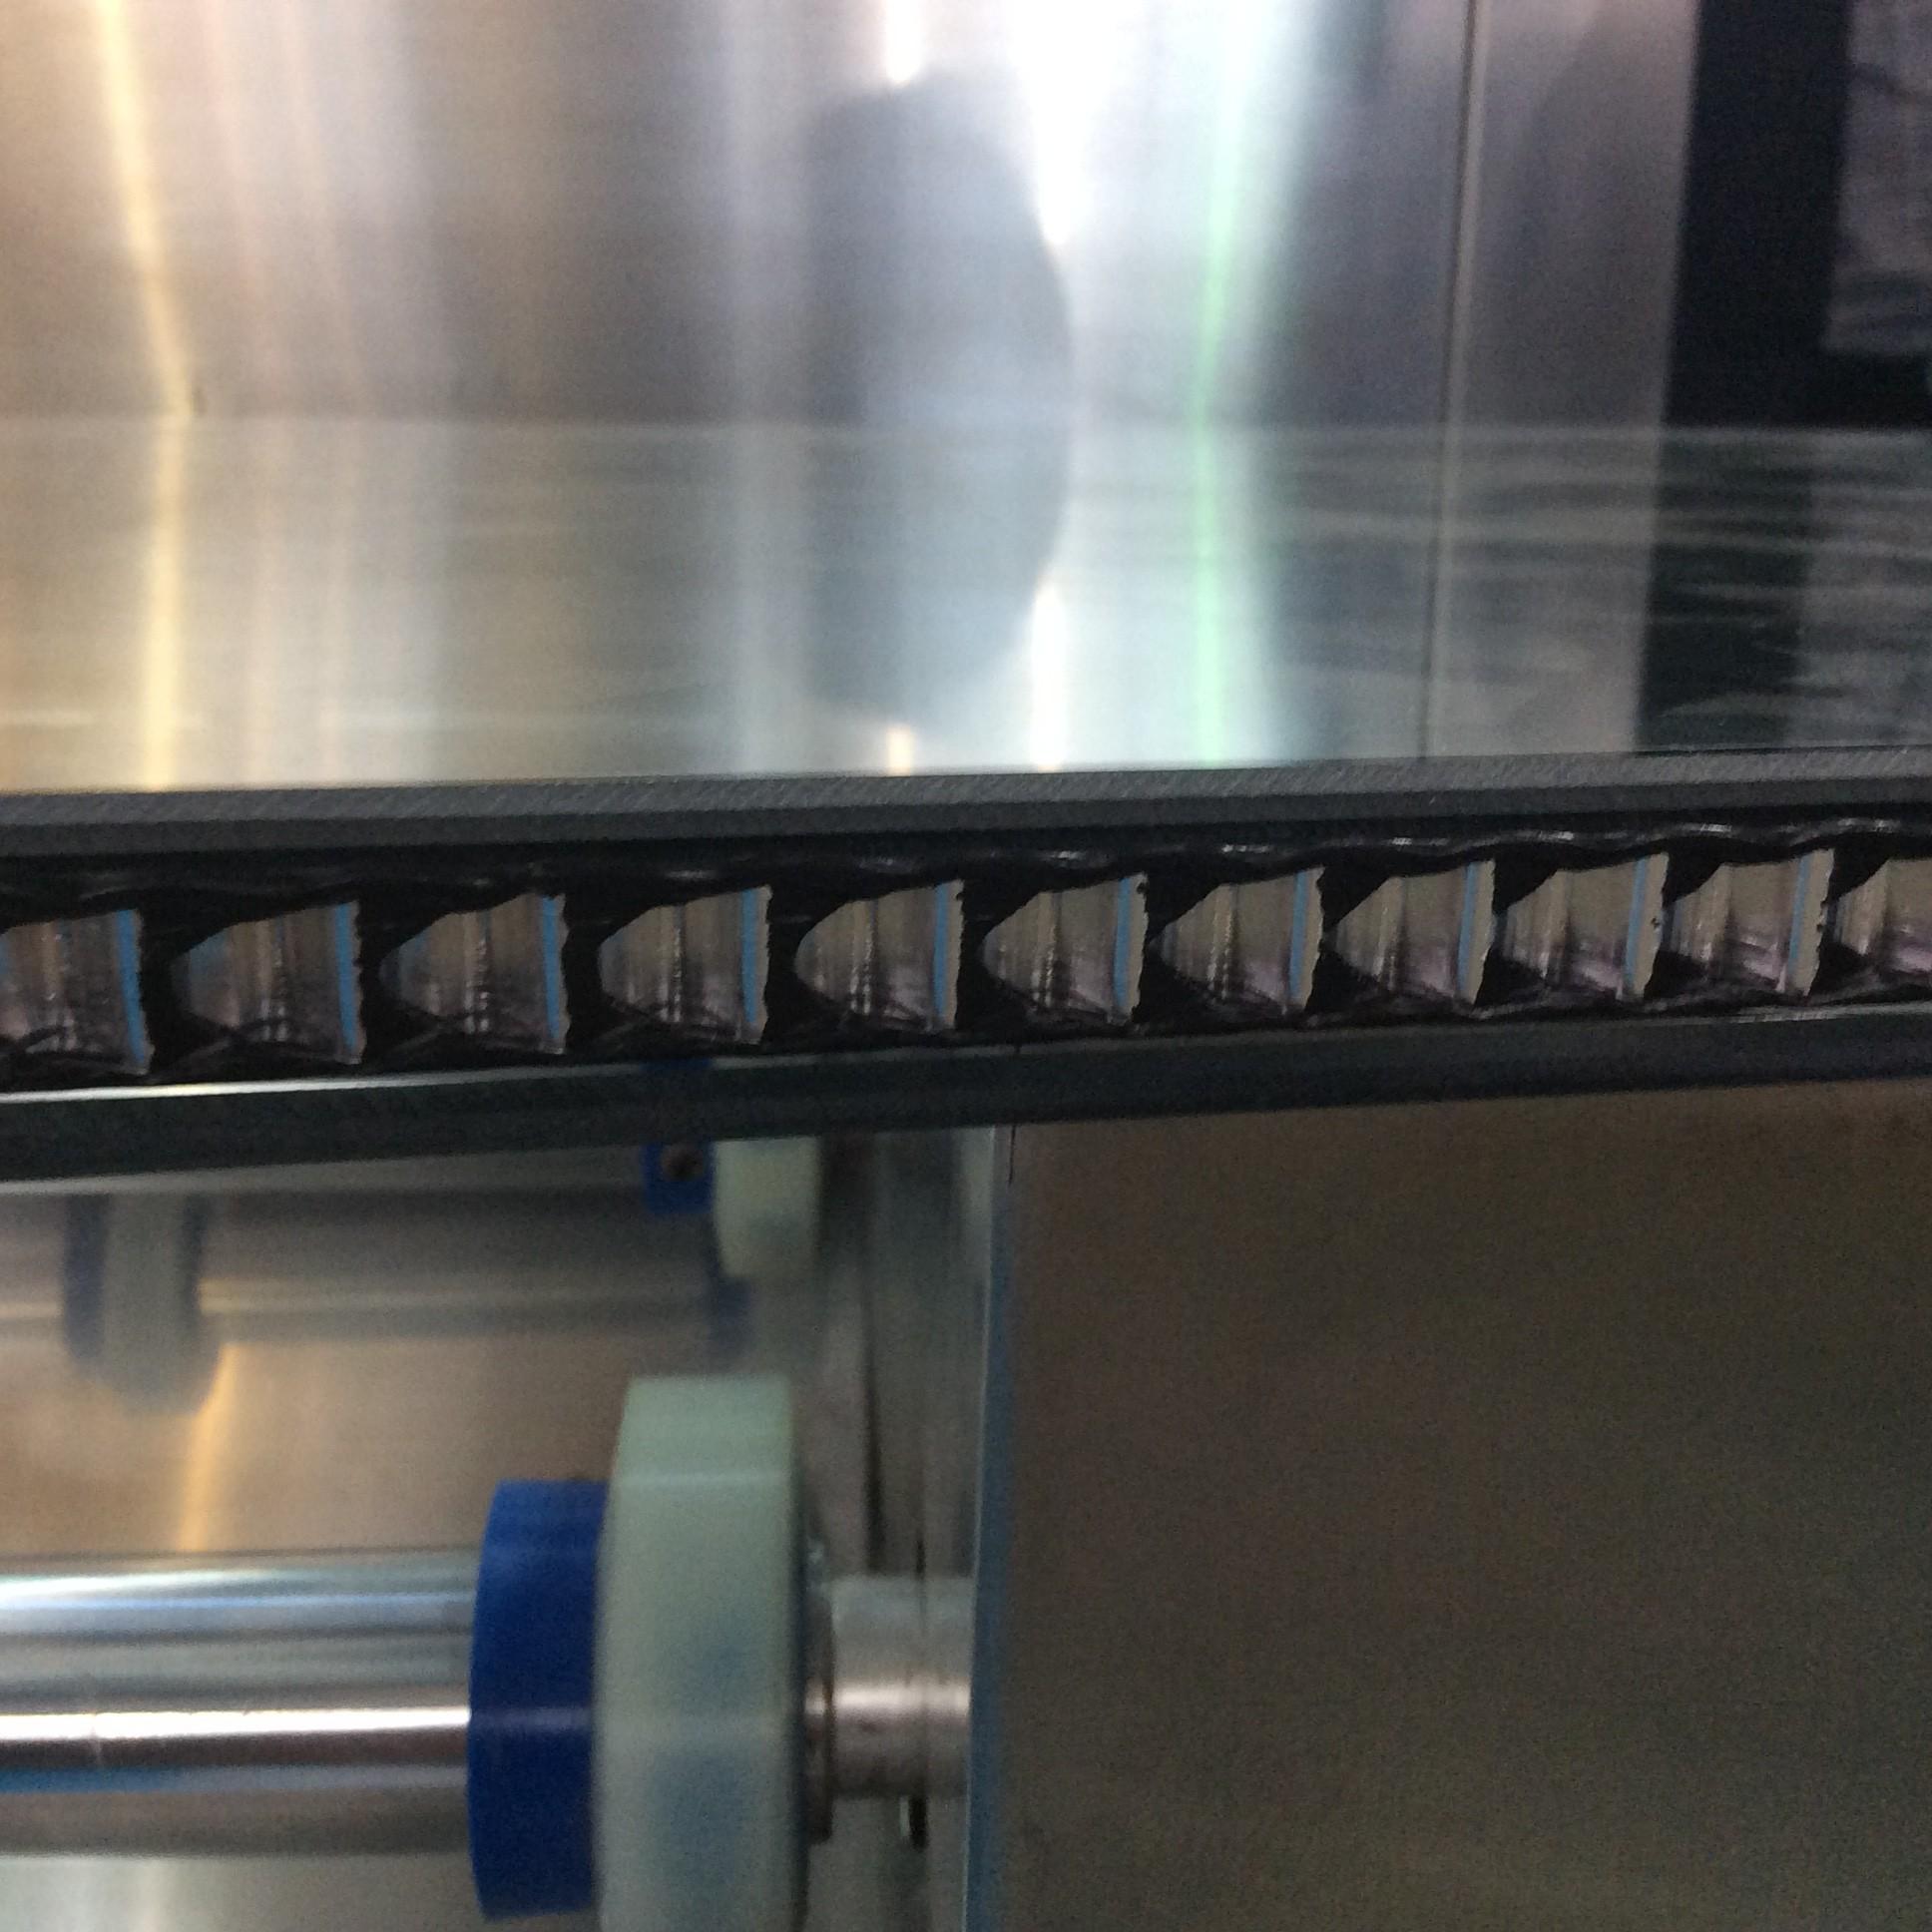 Insulating Glass Butyl Sealing Spacer Bar